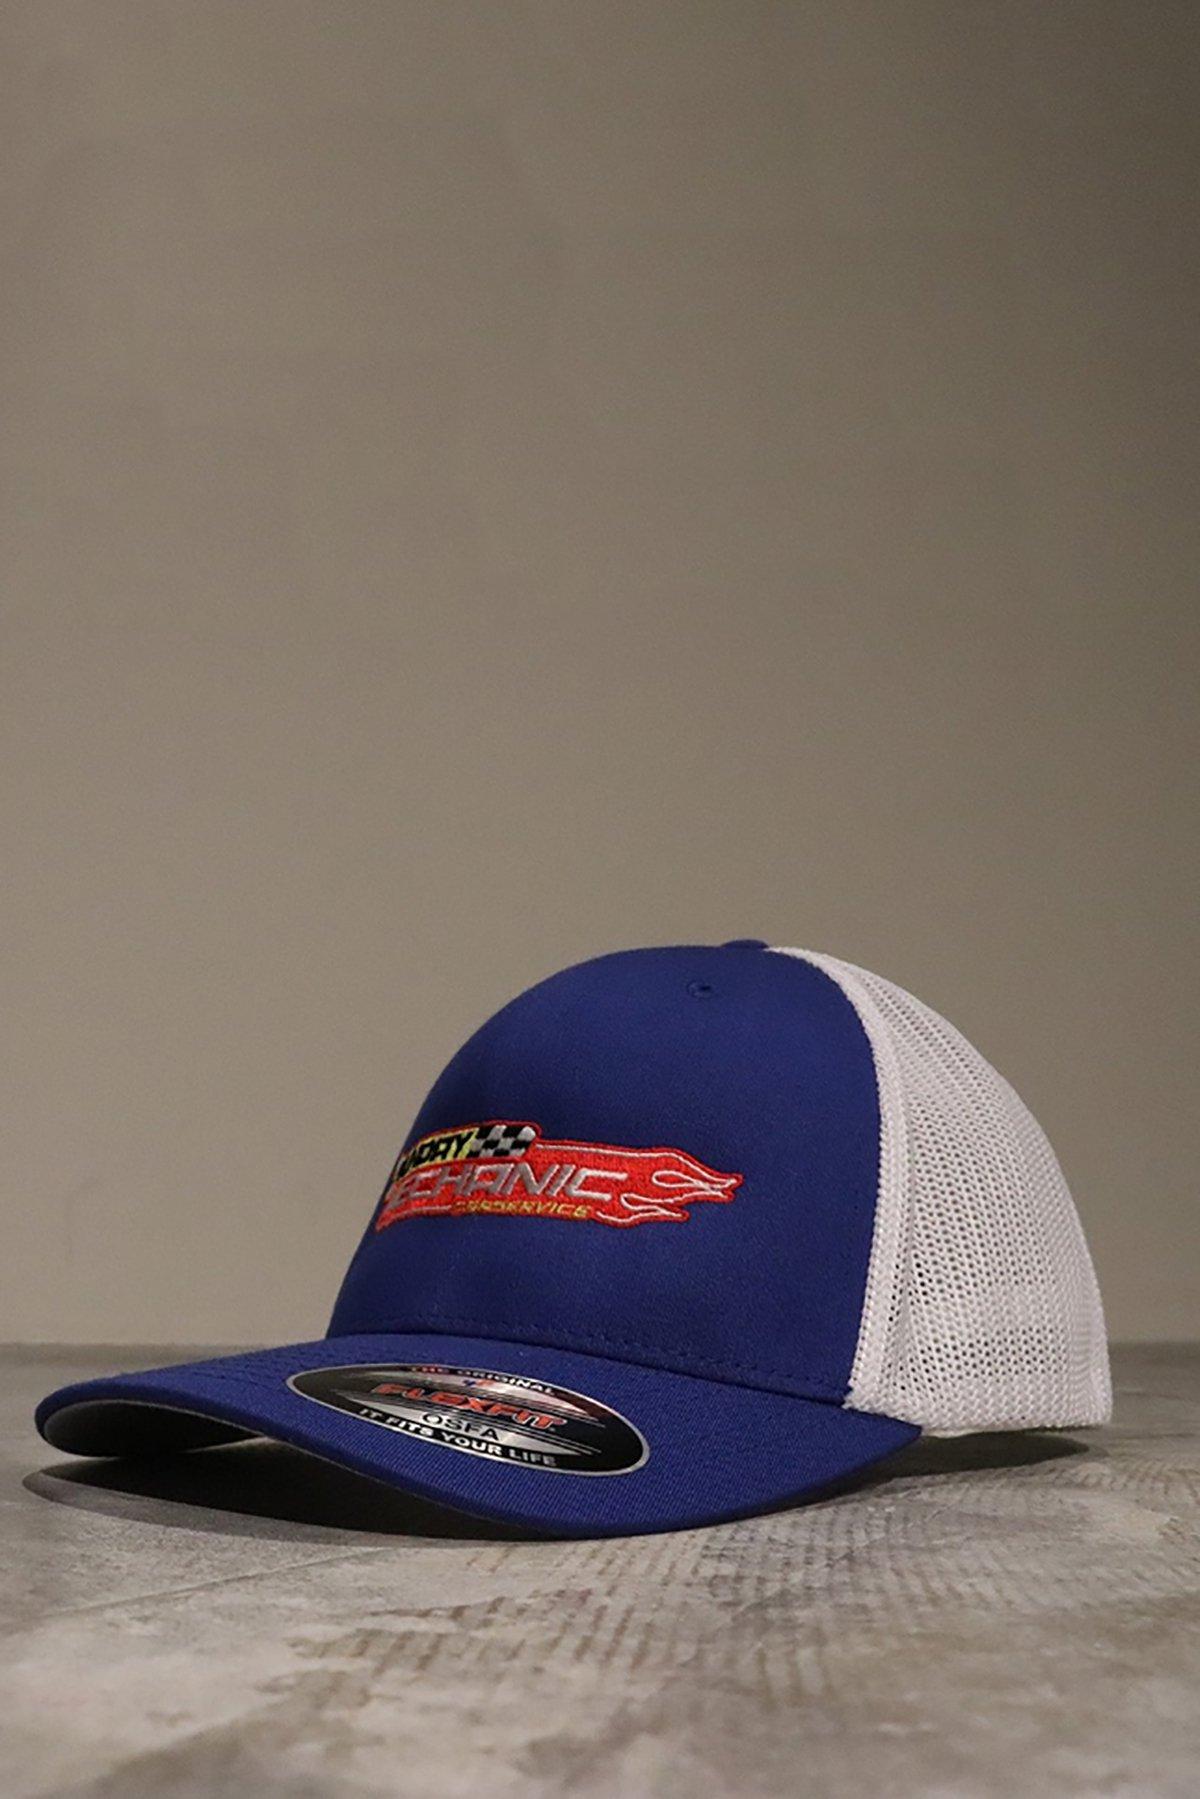 Carservice / SUNDAY MECHANIC LOGO CAP